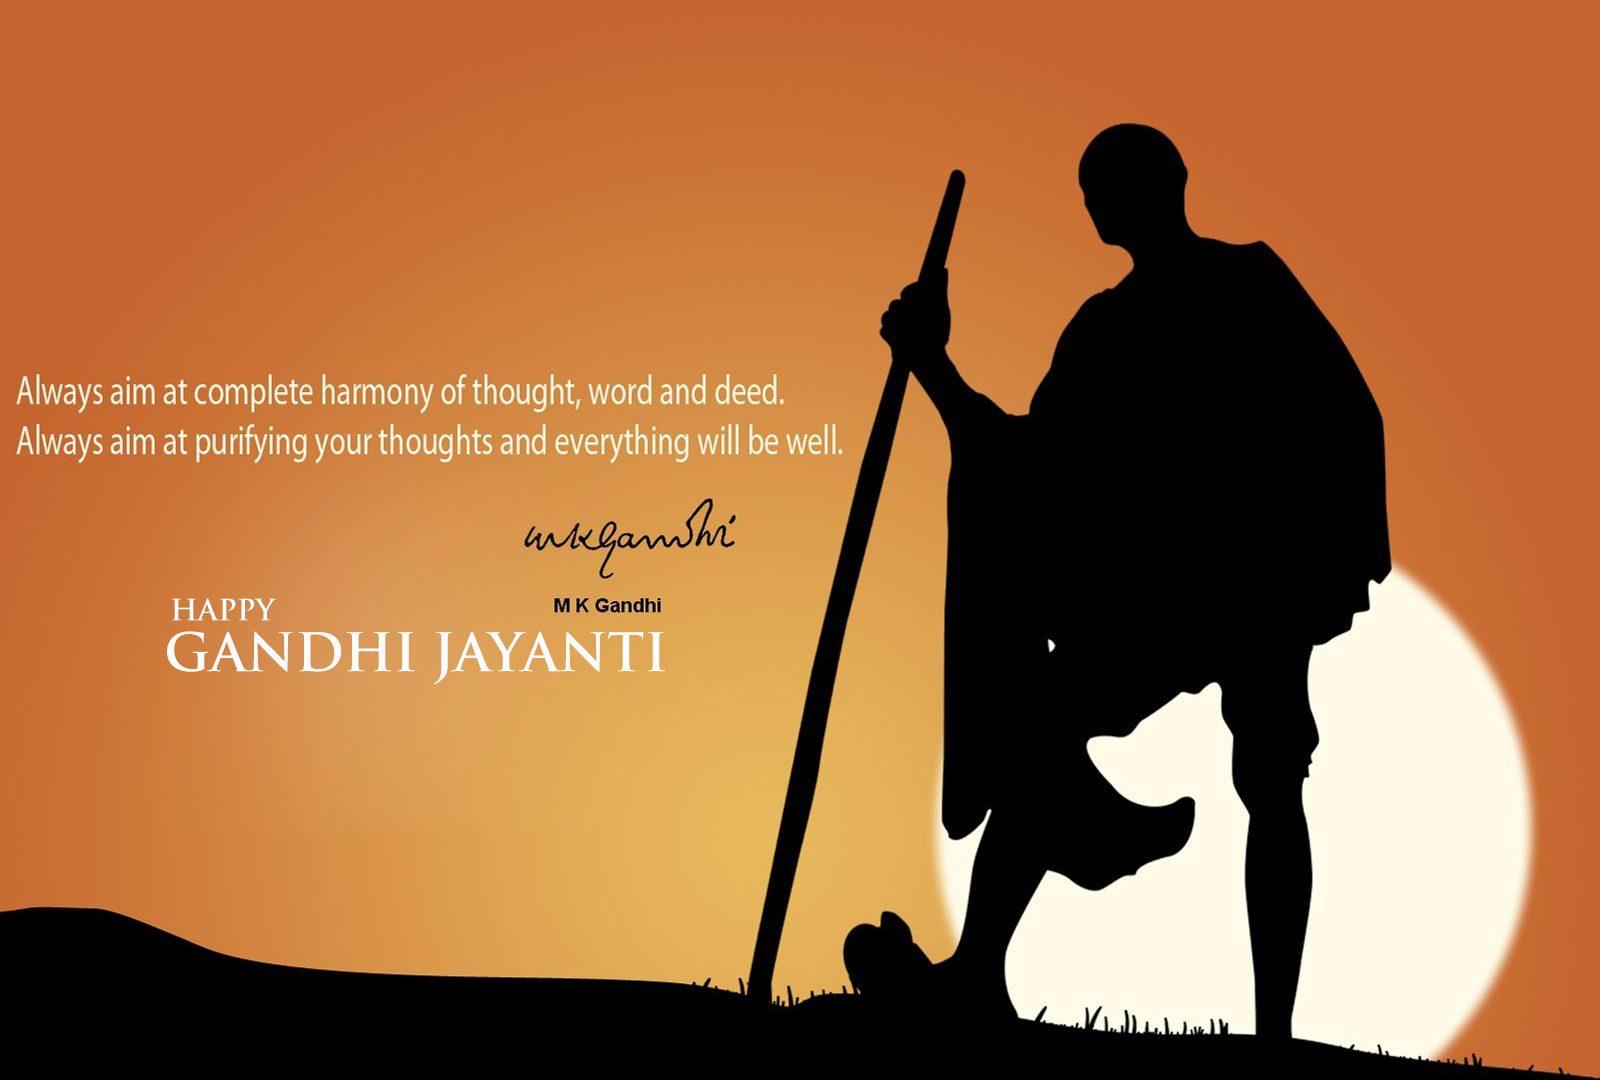 1600x1080 Happy Gandhi Jayanti Best Hd Wallpaper 33674